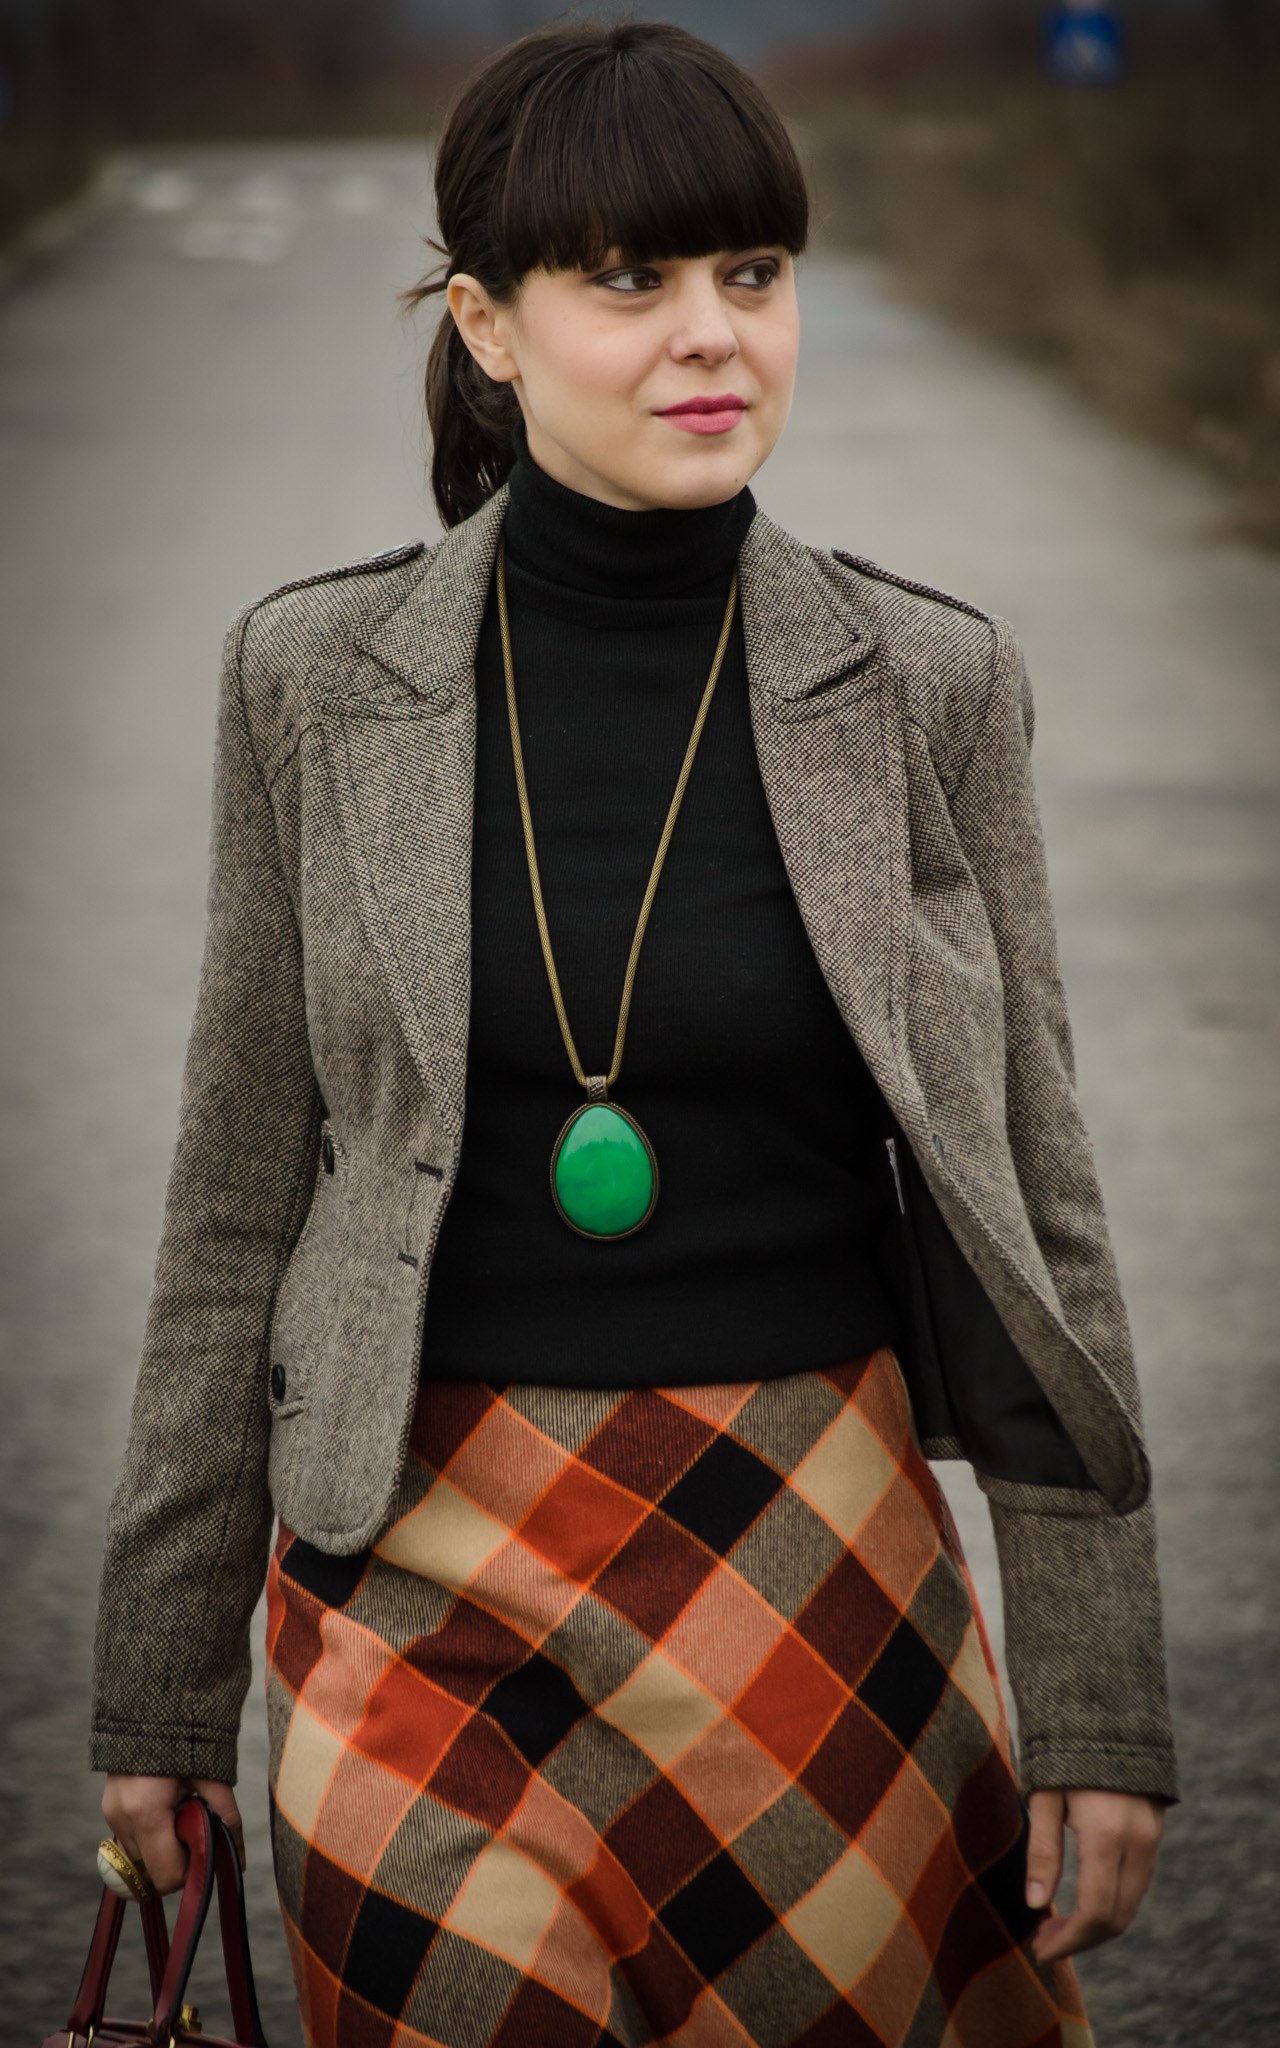 a-line checkers skirt 70s black turtleneck vintage thrifted koton burgundy shoes handbag high heels statement green jewlery necklace